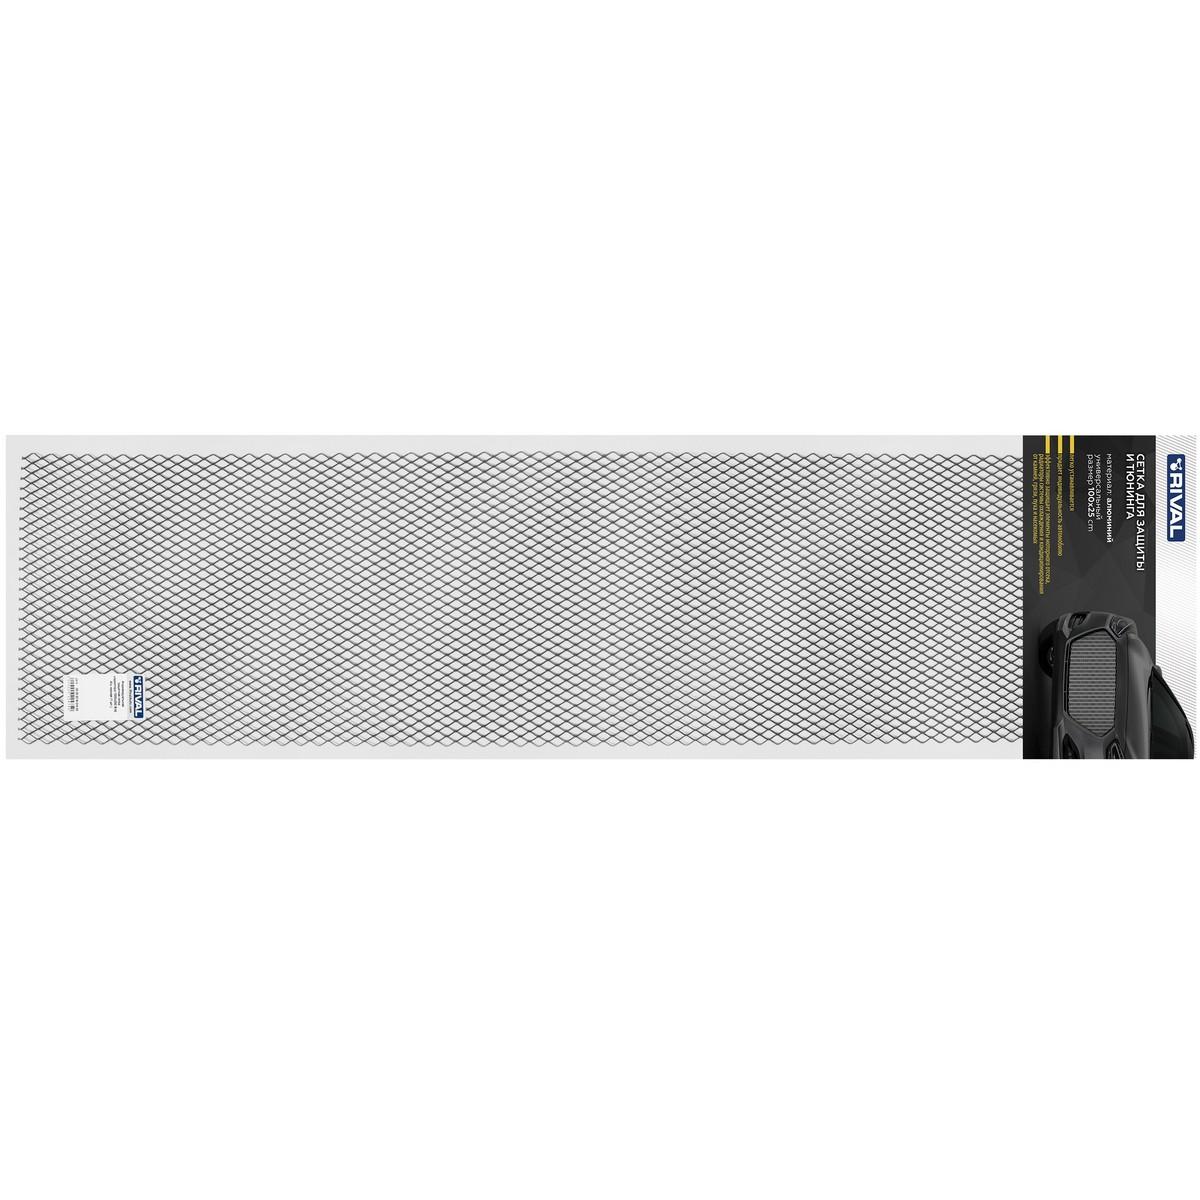 Универсальная сетка Rival 1000х250 R16 для защиты